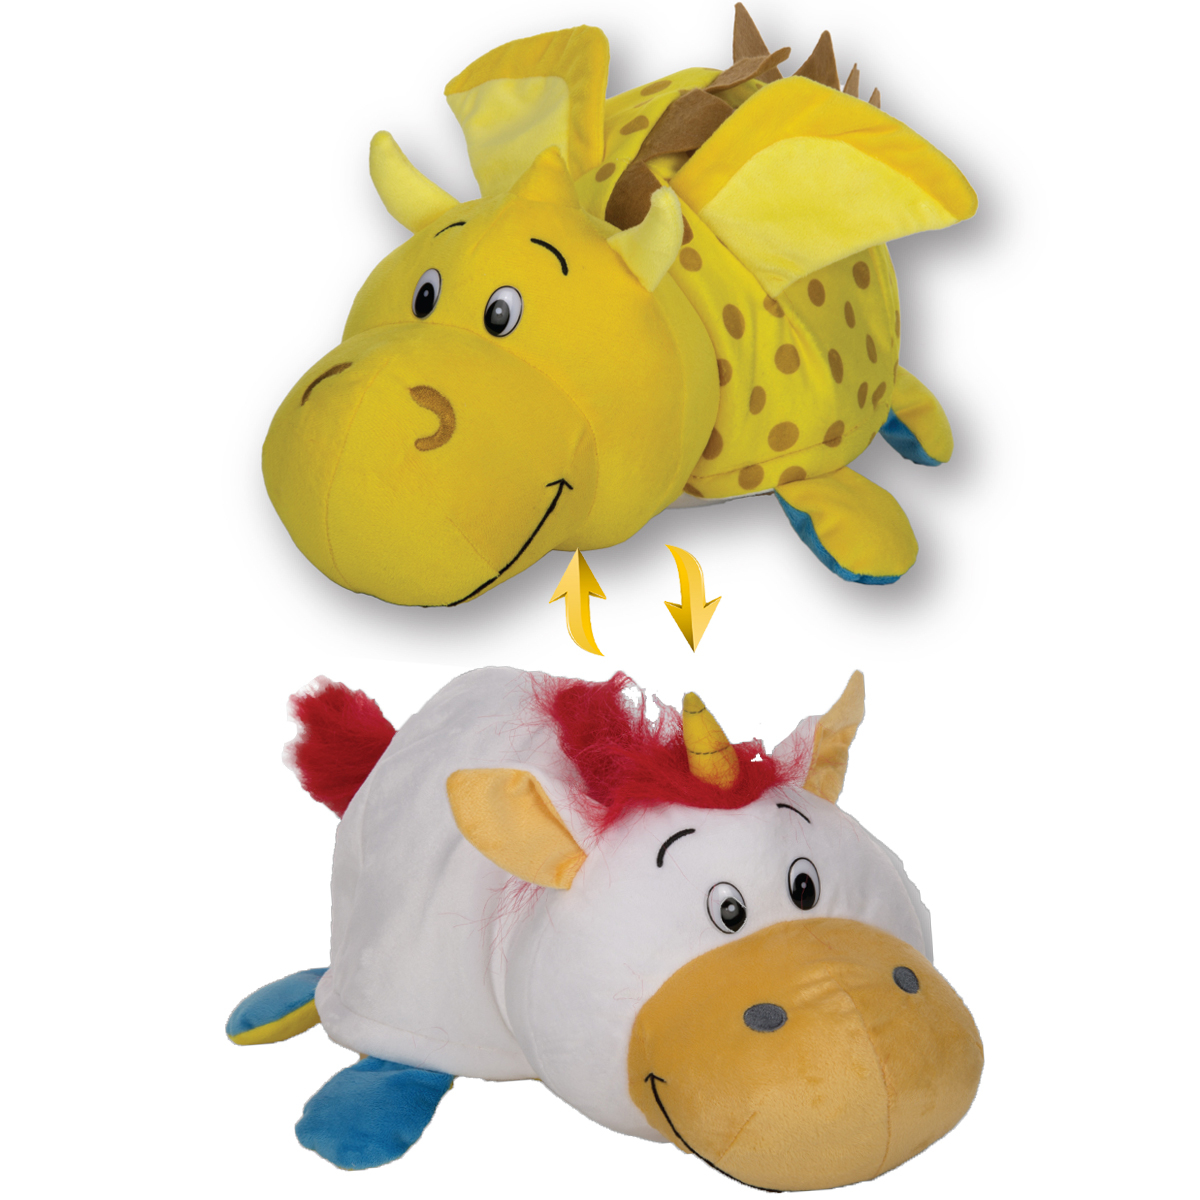 мягкие игрушки 1toy вывернушка подушка единорог щенок т12045 Мягкая игрушка 1toy Вывернушка Дракон-Единорог Т12335